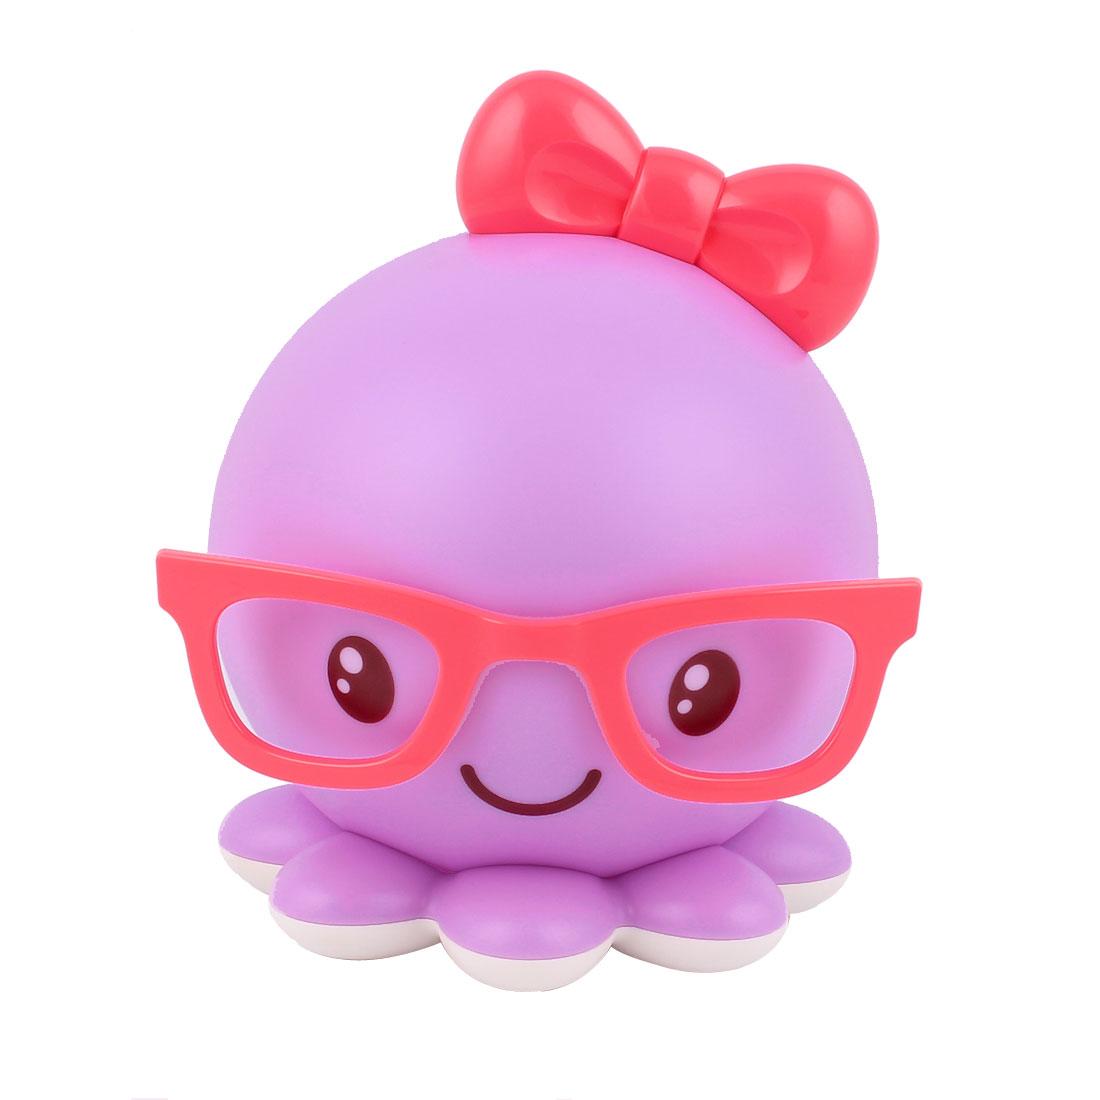 0.3W DC 5V Octopus Lamp USB Rechargeable LED Night Light for Children Toddler